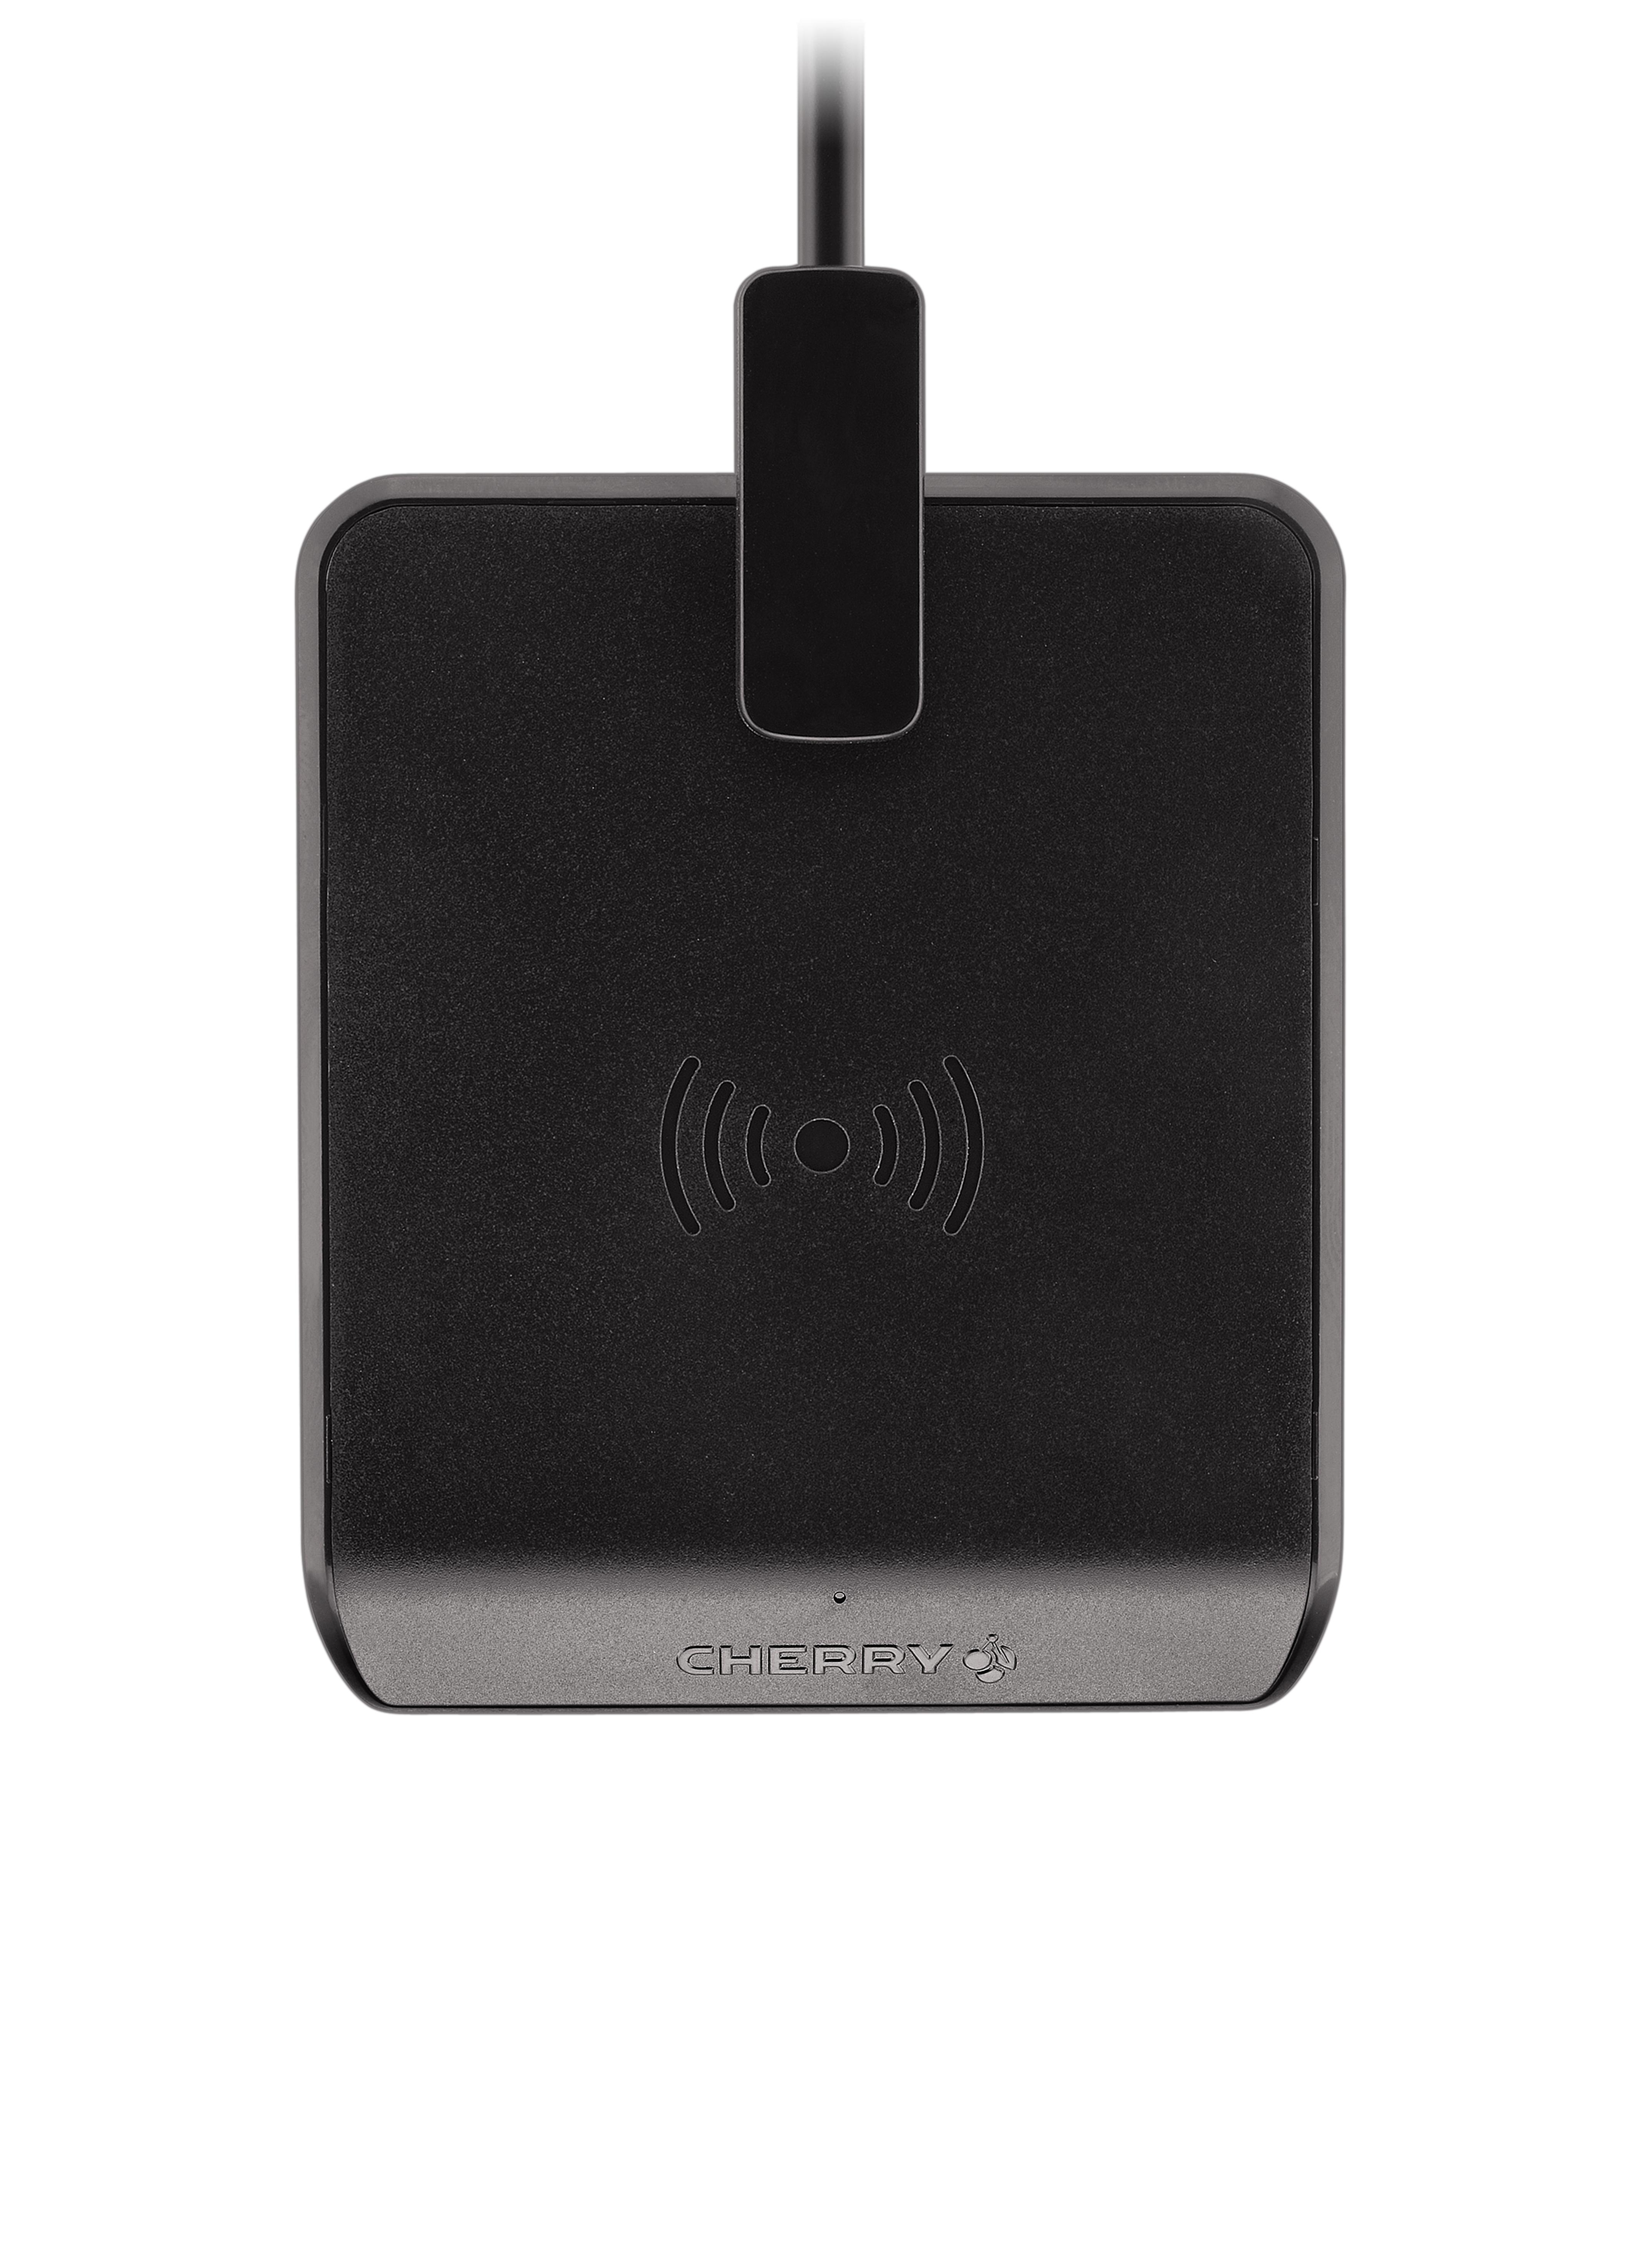 Cherry TC 1200 Innenraum USB 2.0 Schwarz Smart-Card-Lesegerät